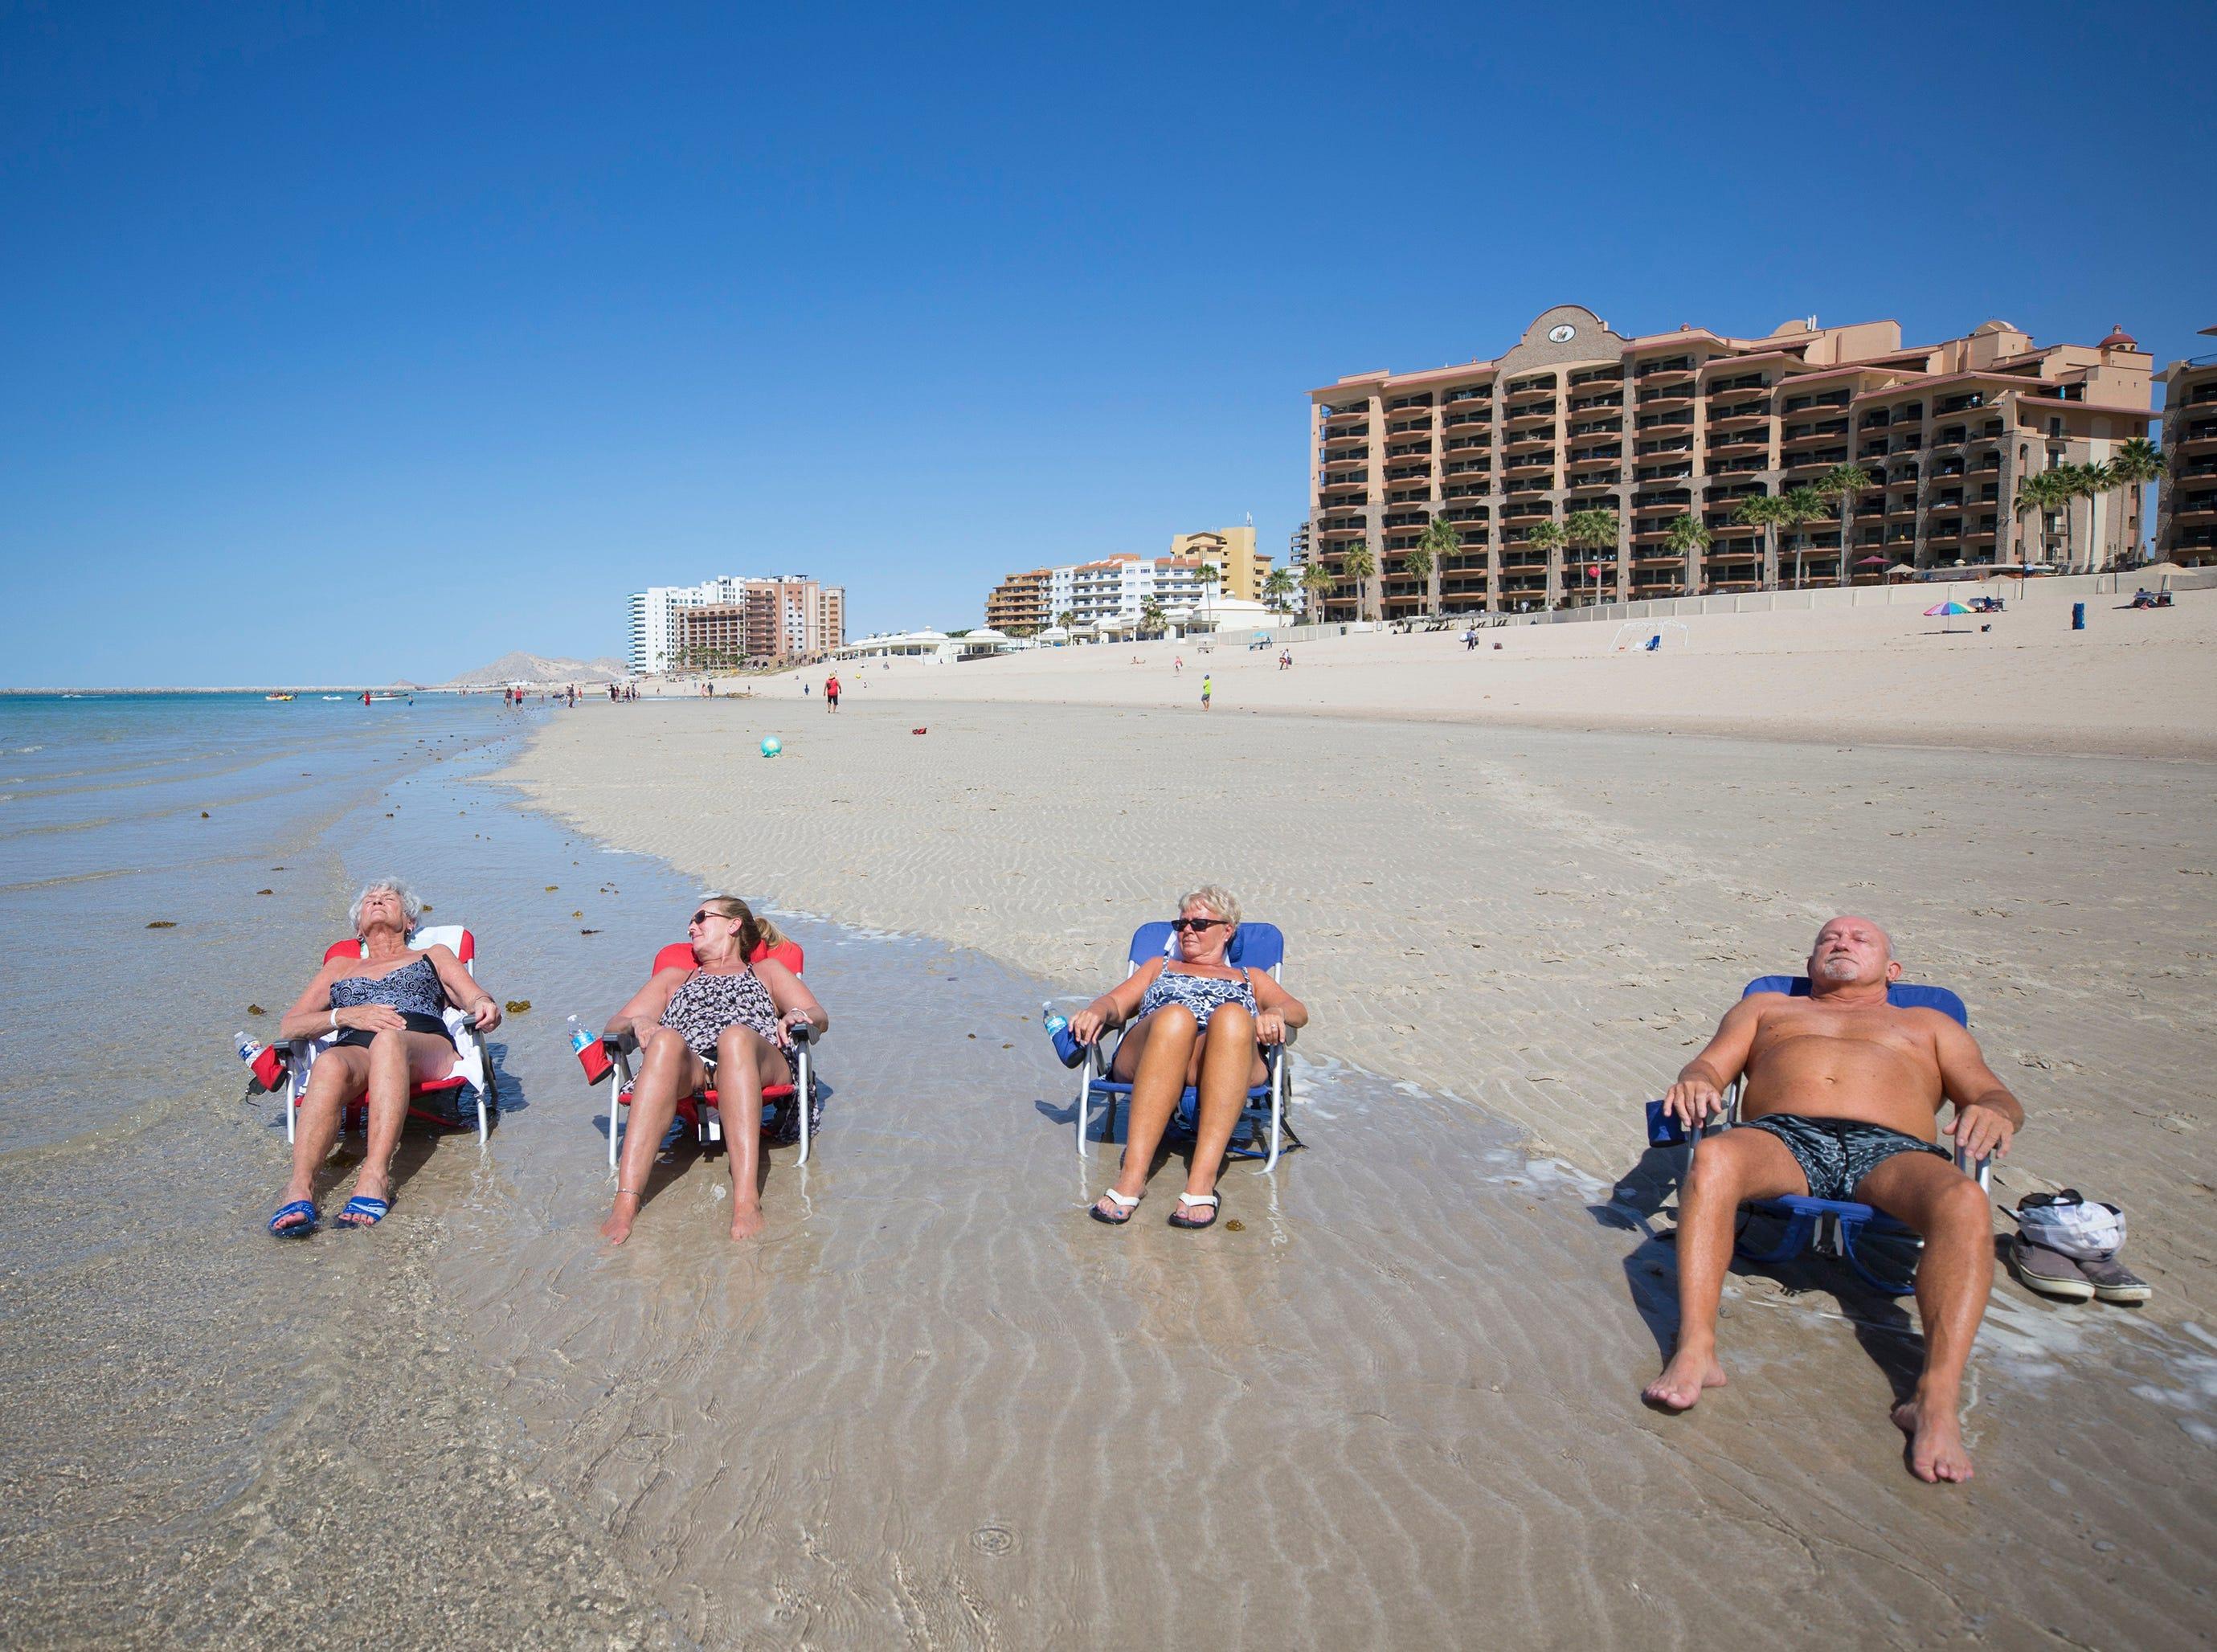 Maureen Clarke, left, Cathy Hein, Ann Shrug and her husband, David, from Canada, soak in the sun on Sandy Beach in Puerto Penasco, Mexico.